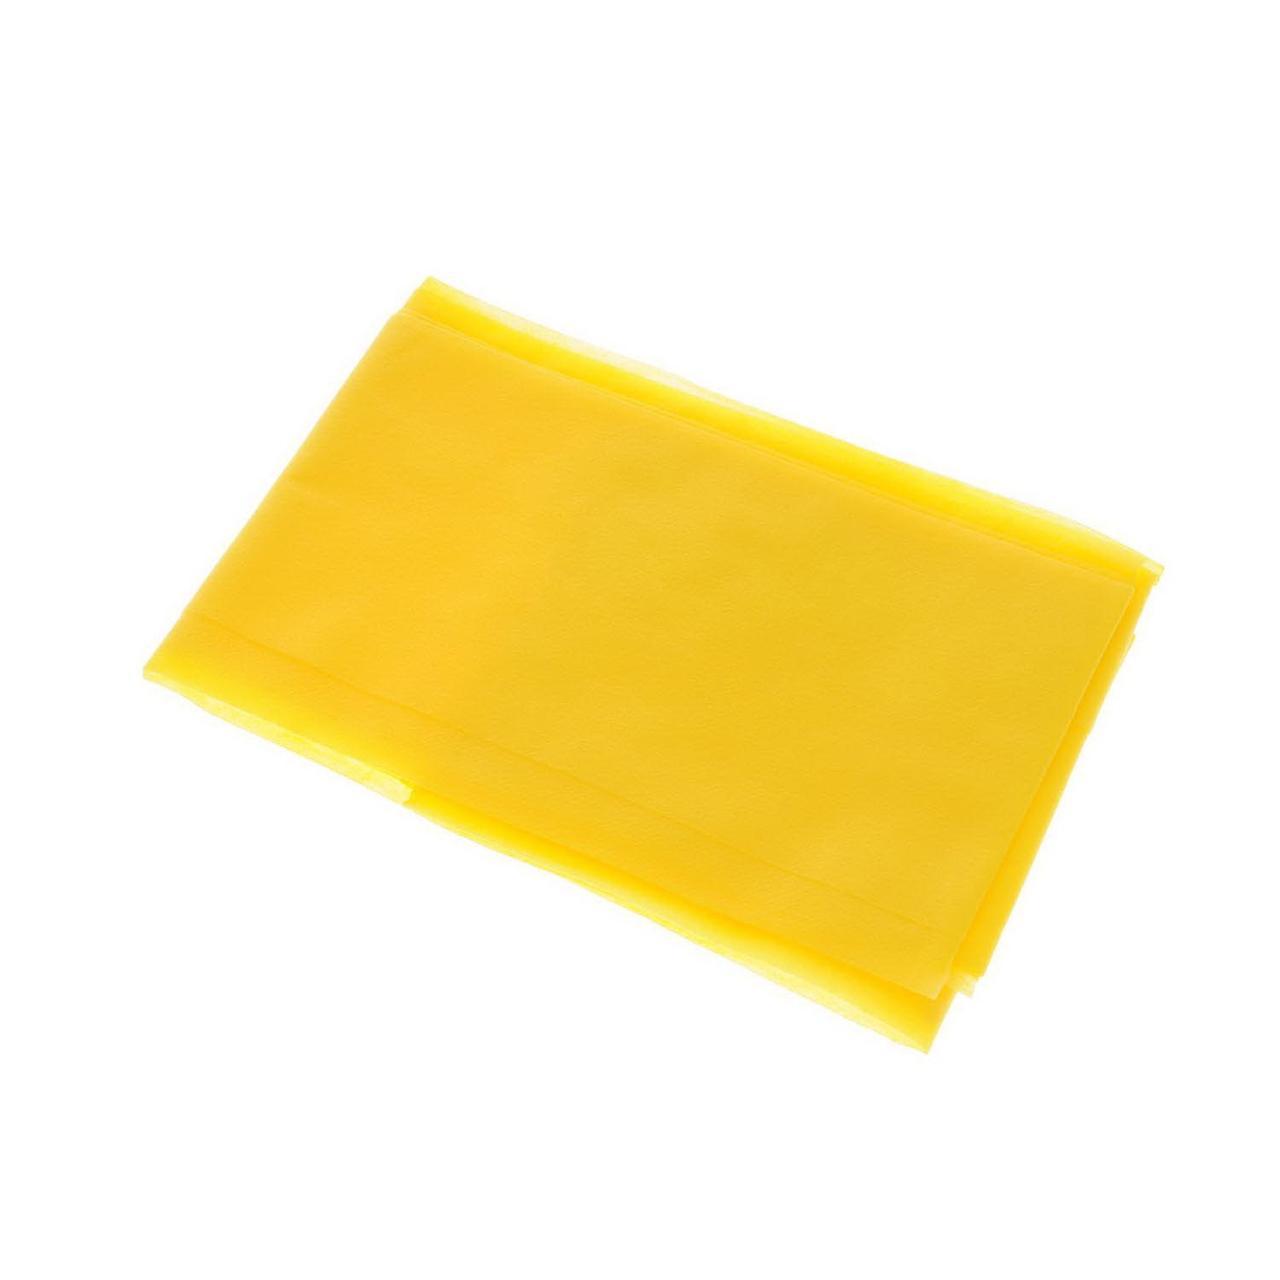 Скатерть 110х140см, жёлт., Спанбонд